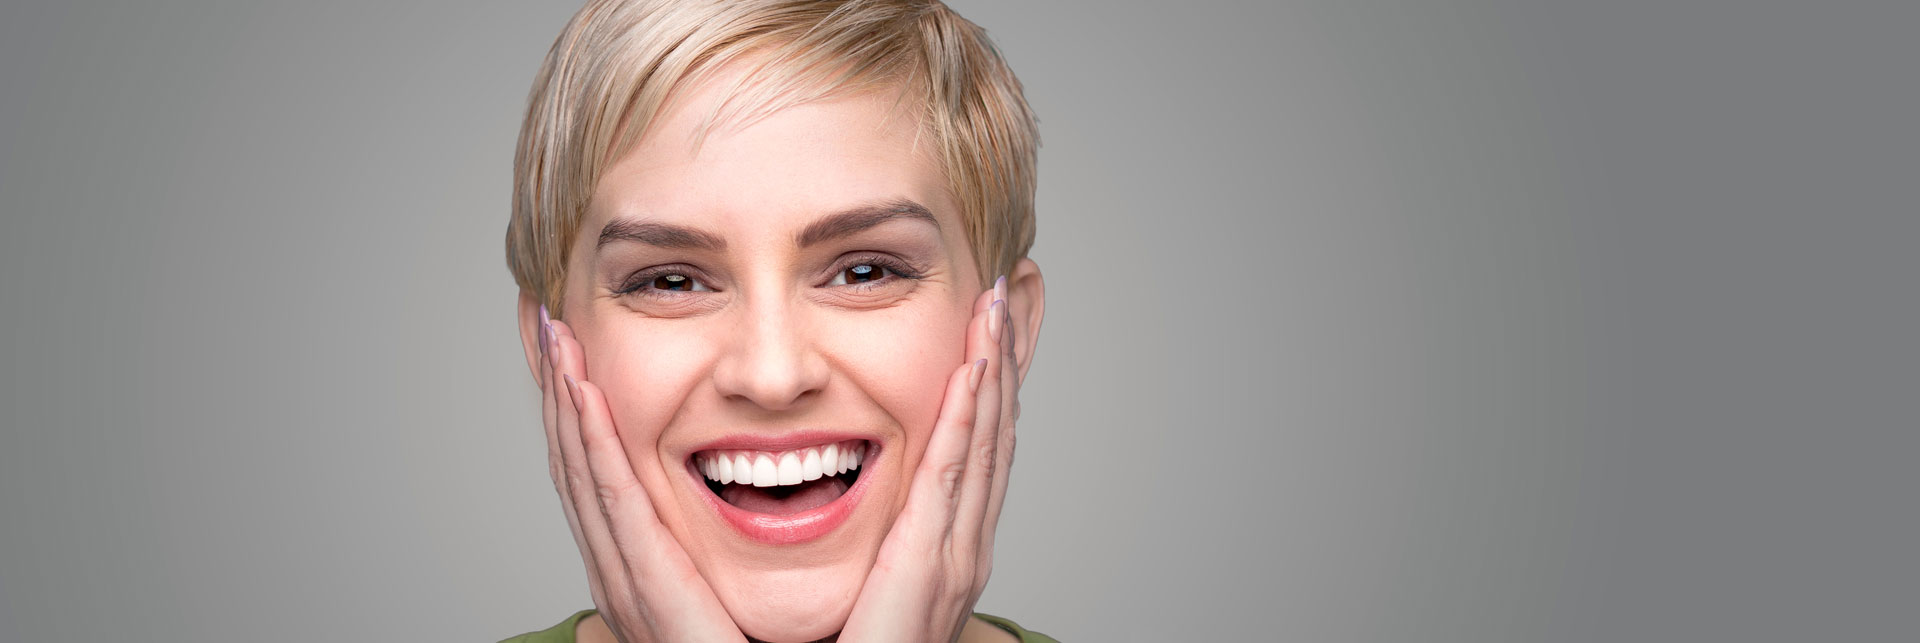 Happy woman who had teeth whitening treatment